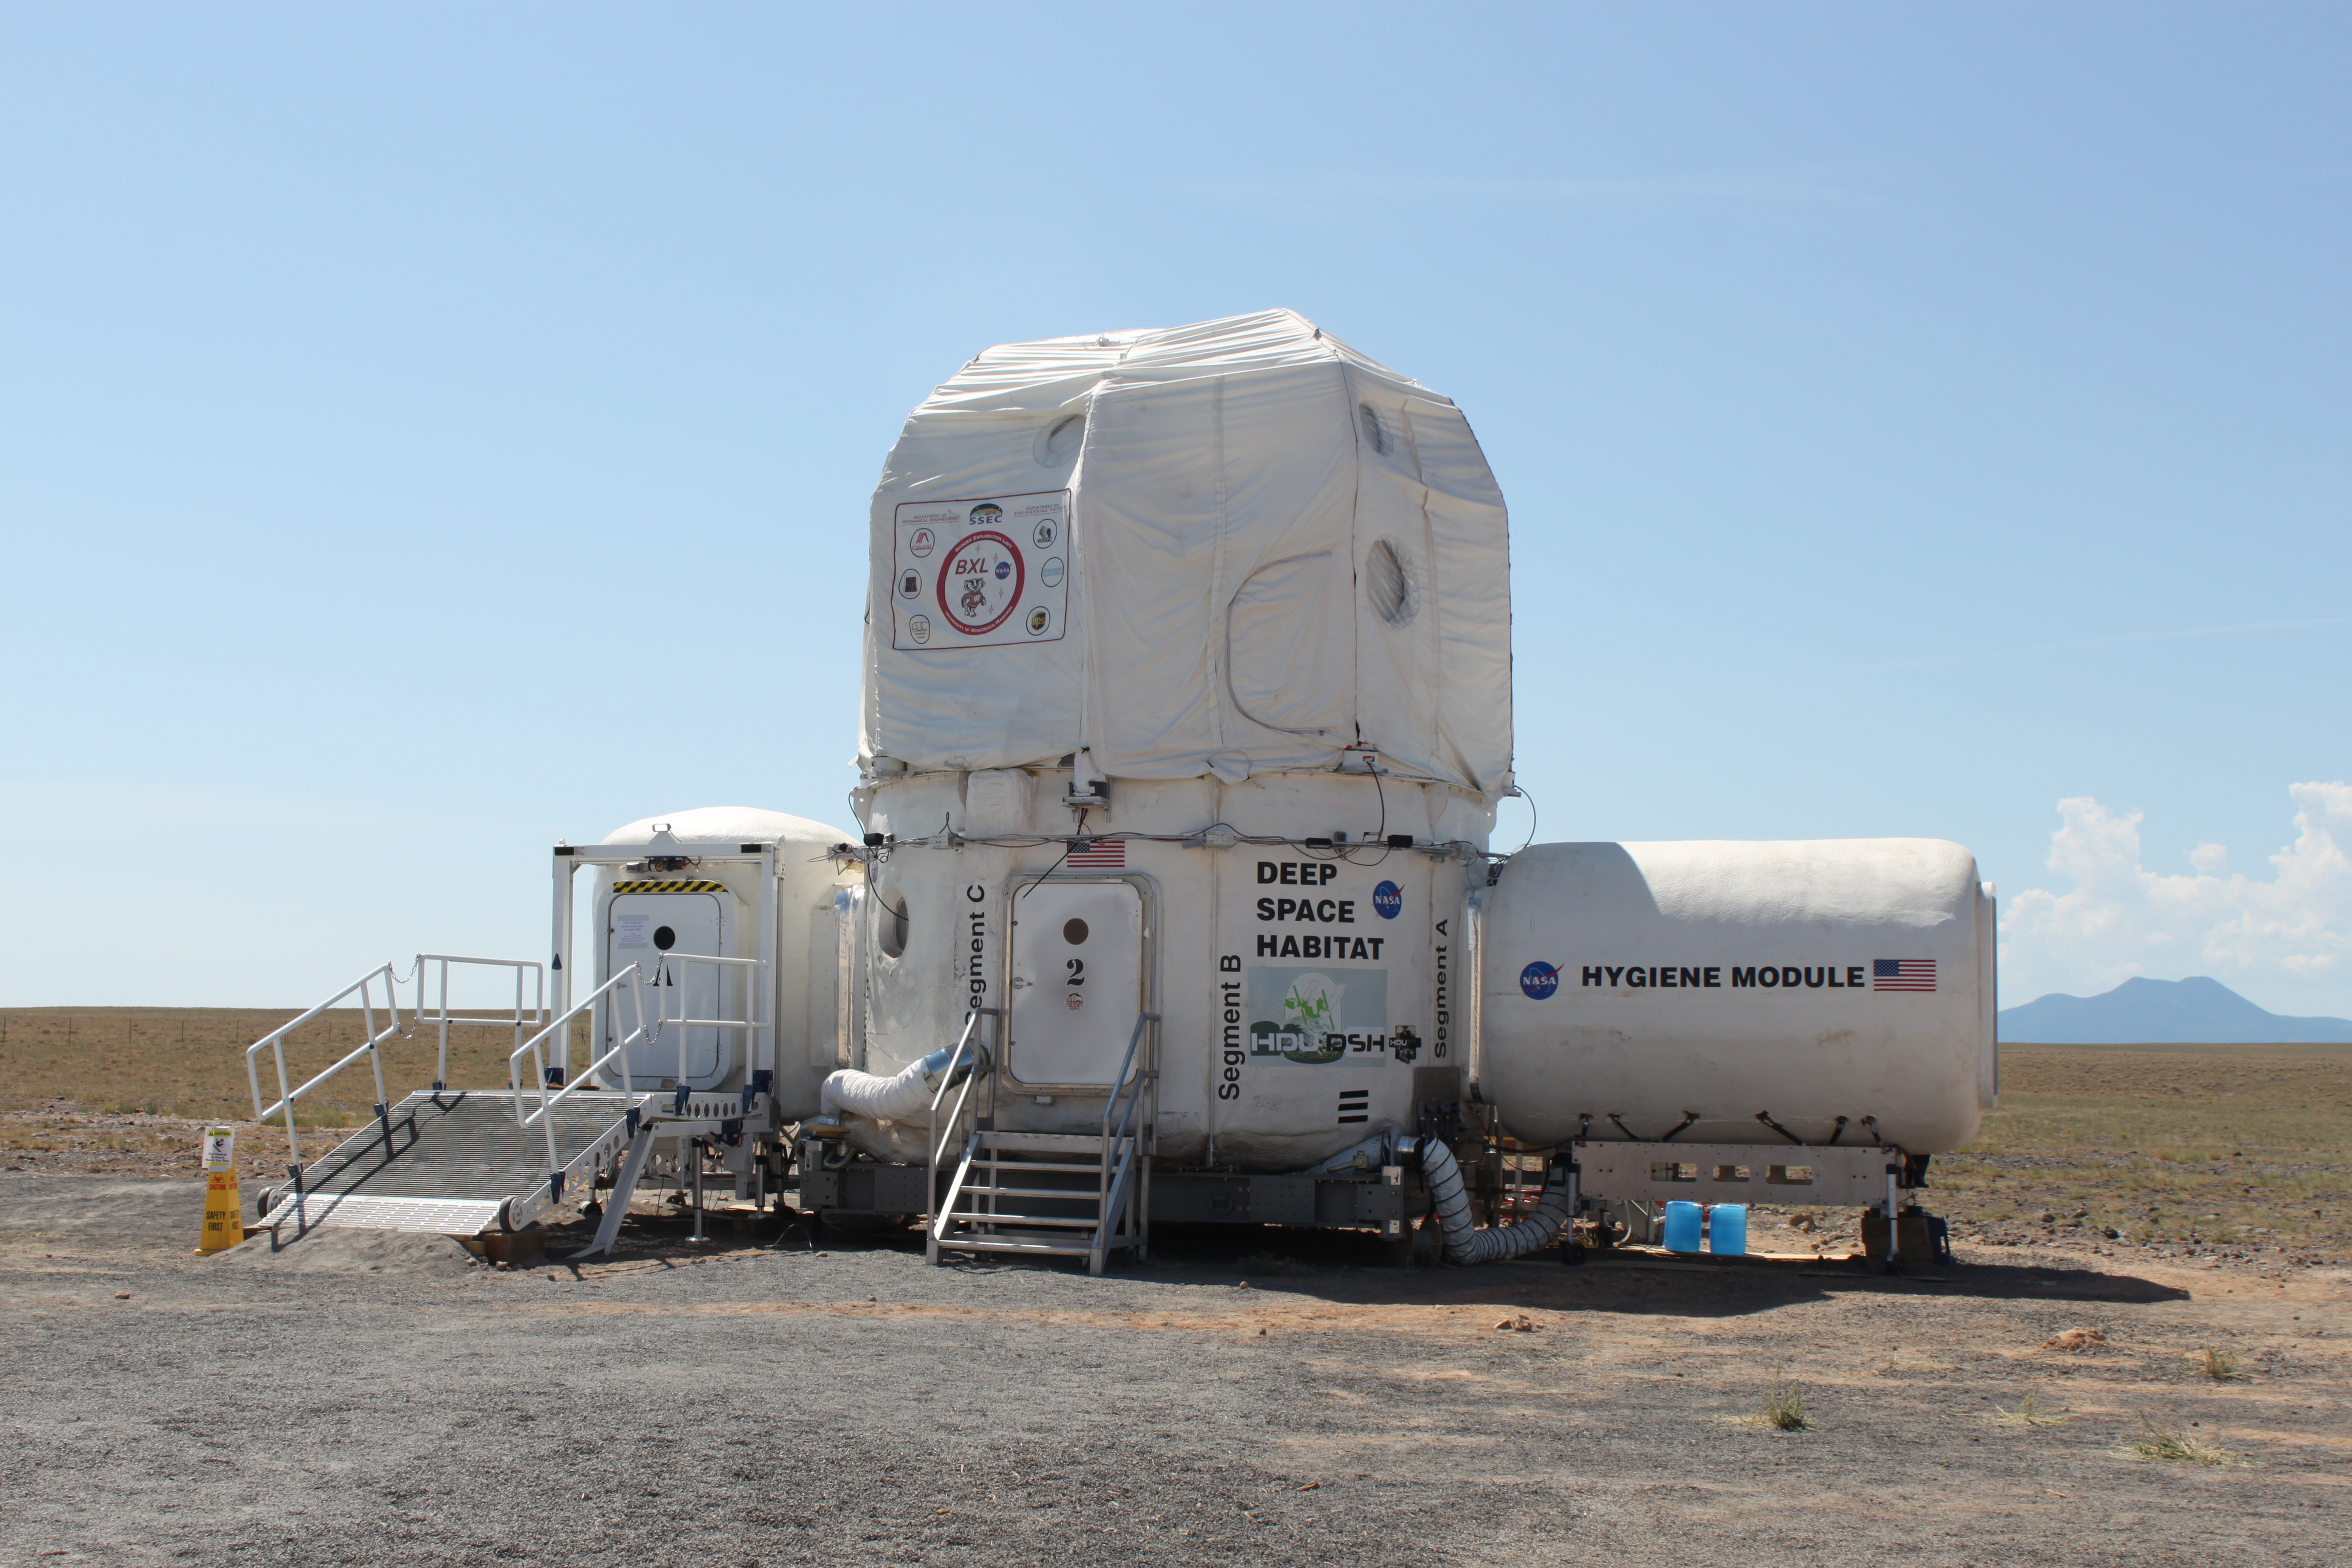 astronaut space habitat - photo #32